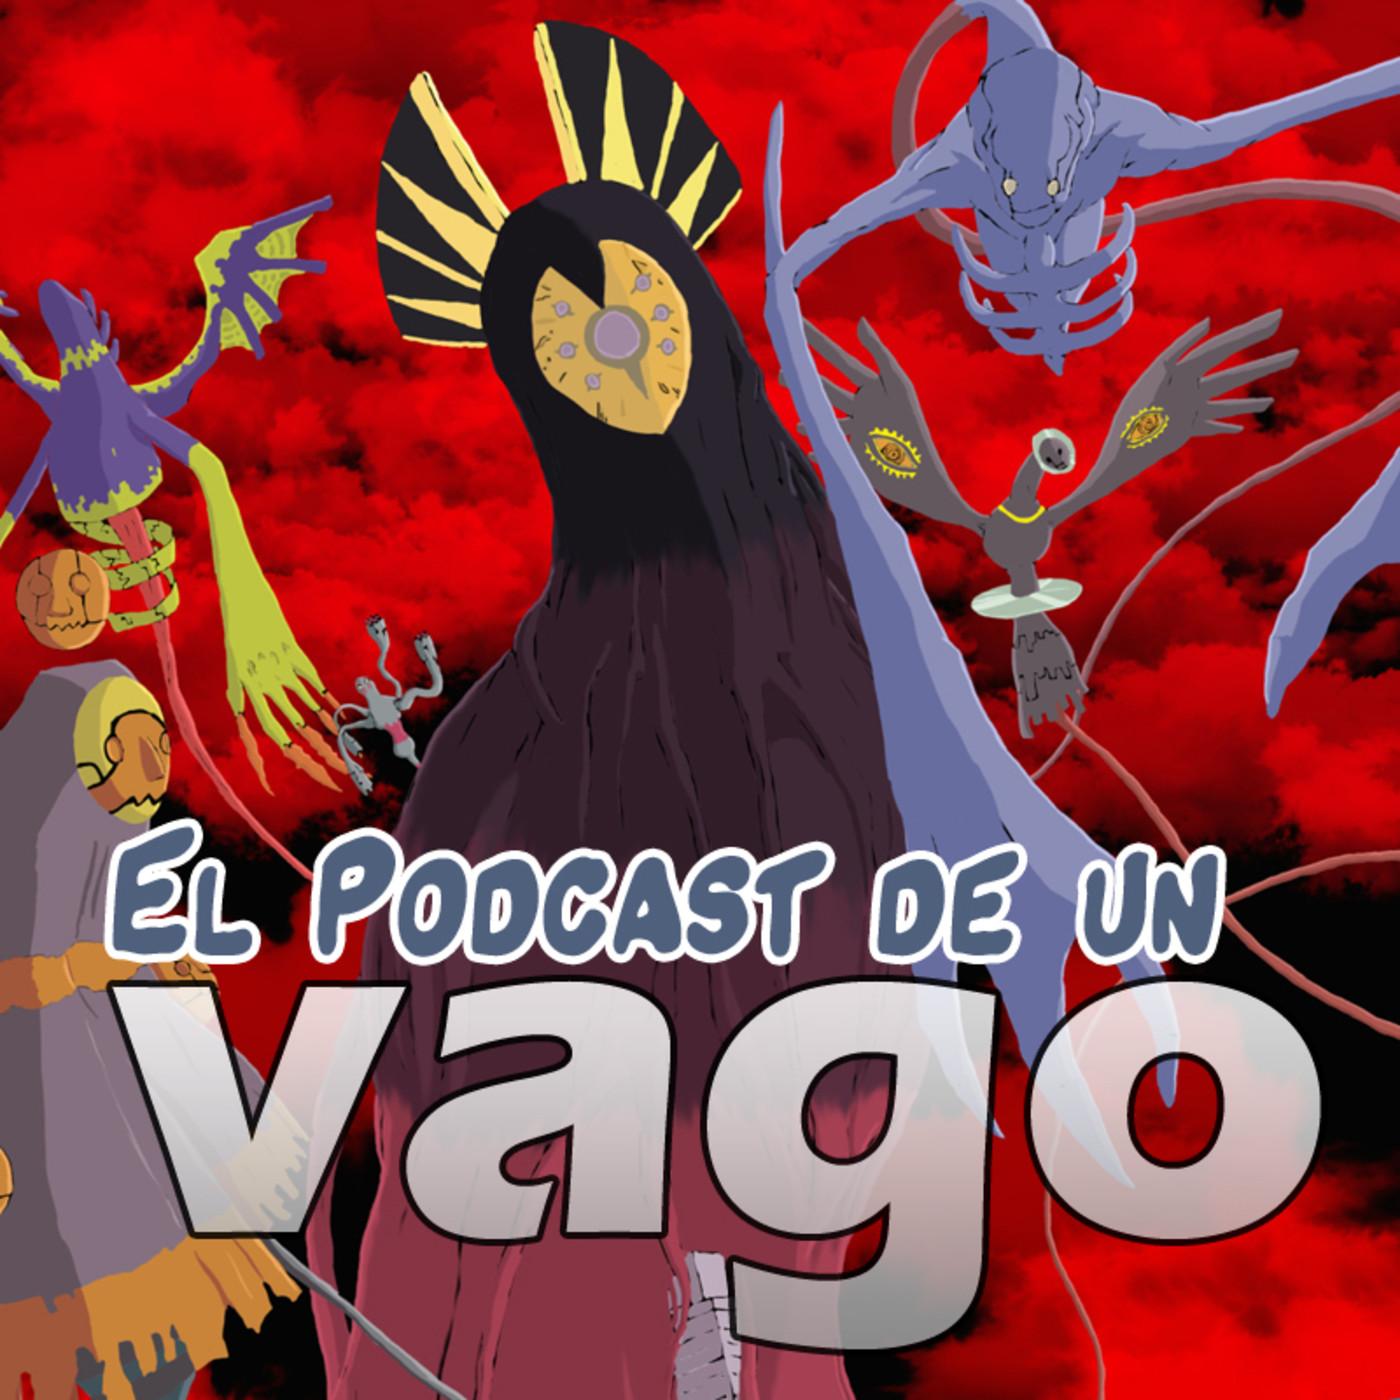 VagoPodcast #88: Sobre Virus y Viruses el D-Reaper